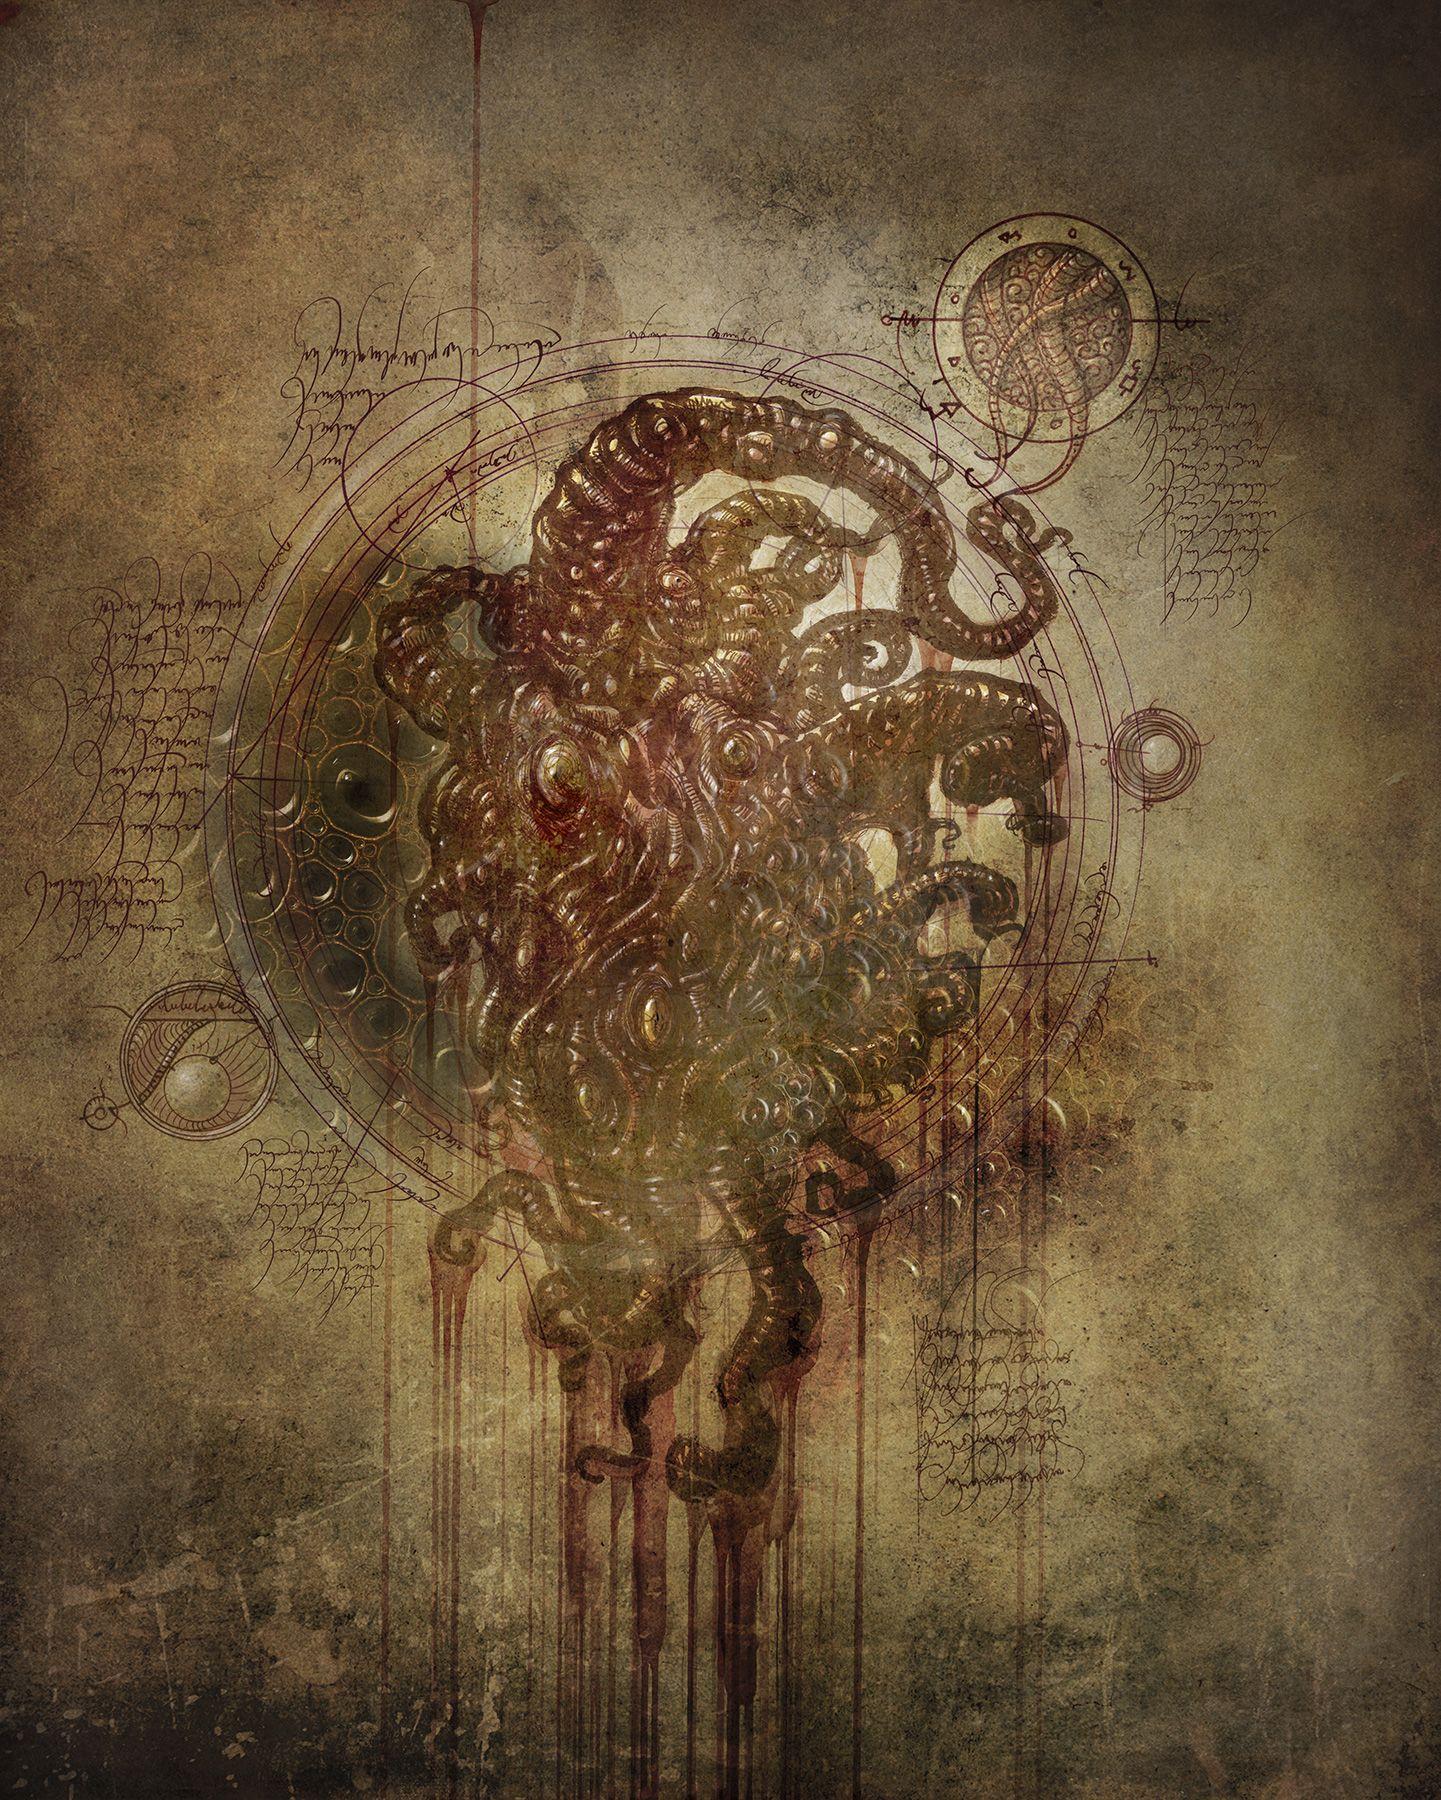 Dark Young Xvi Seal Of Confinement In 2020 Necromancer Book Creature Art Demonology